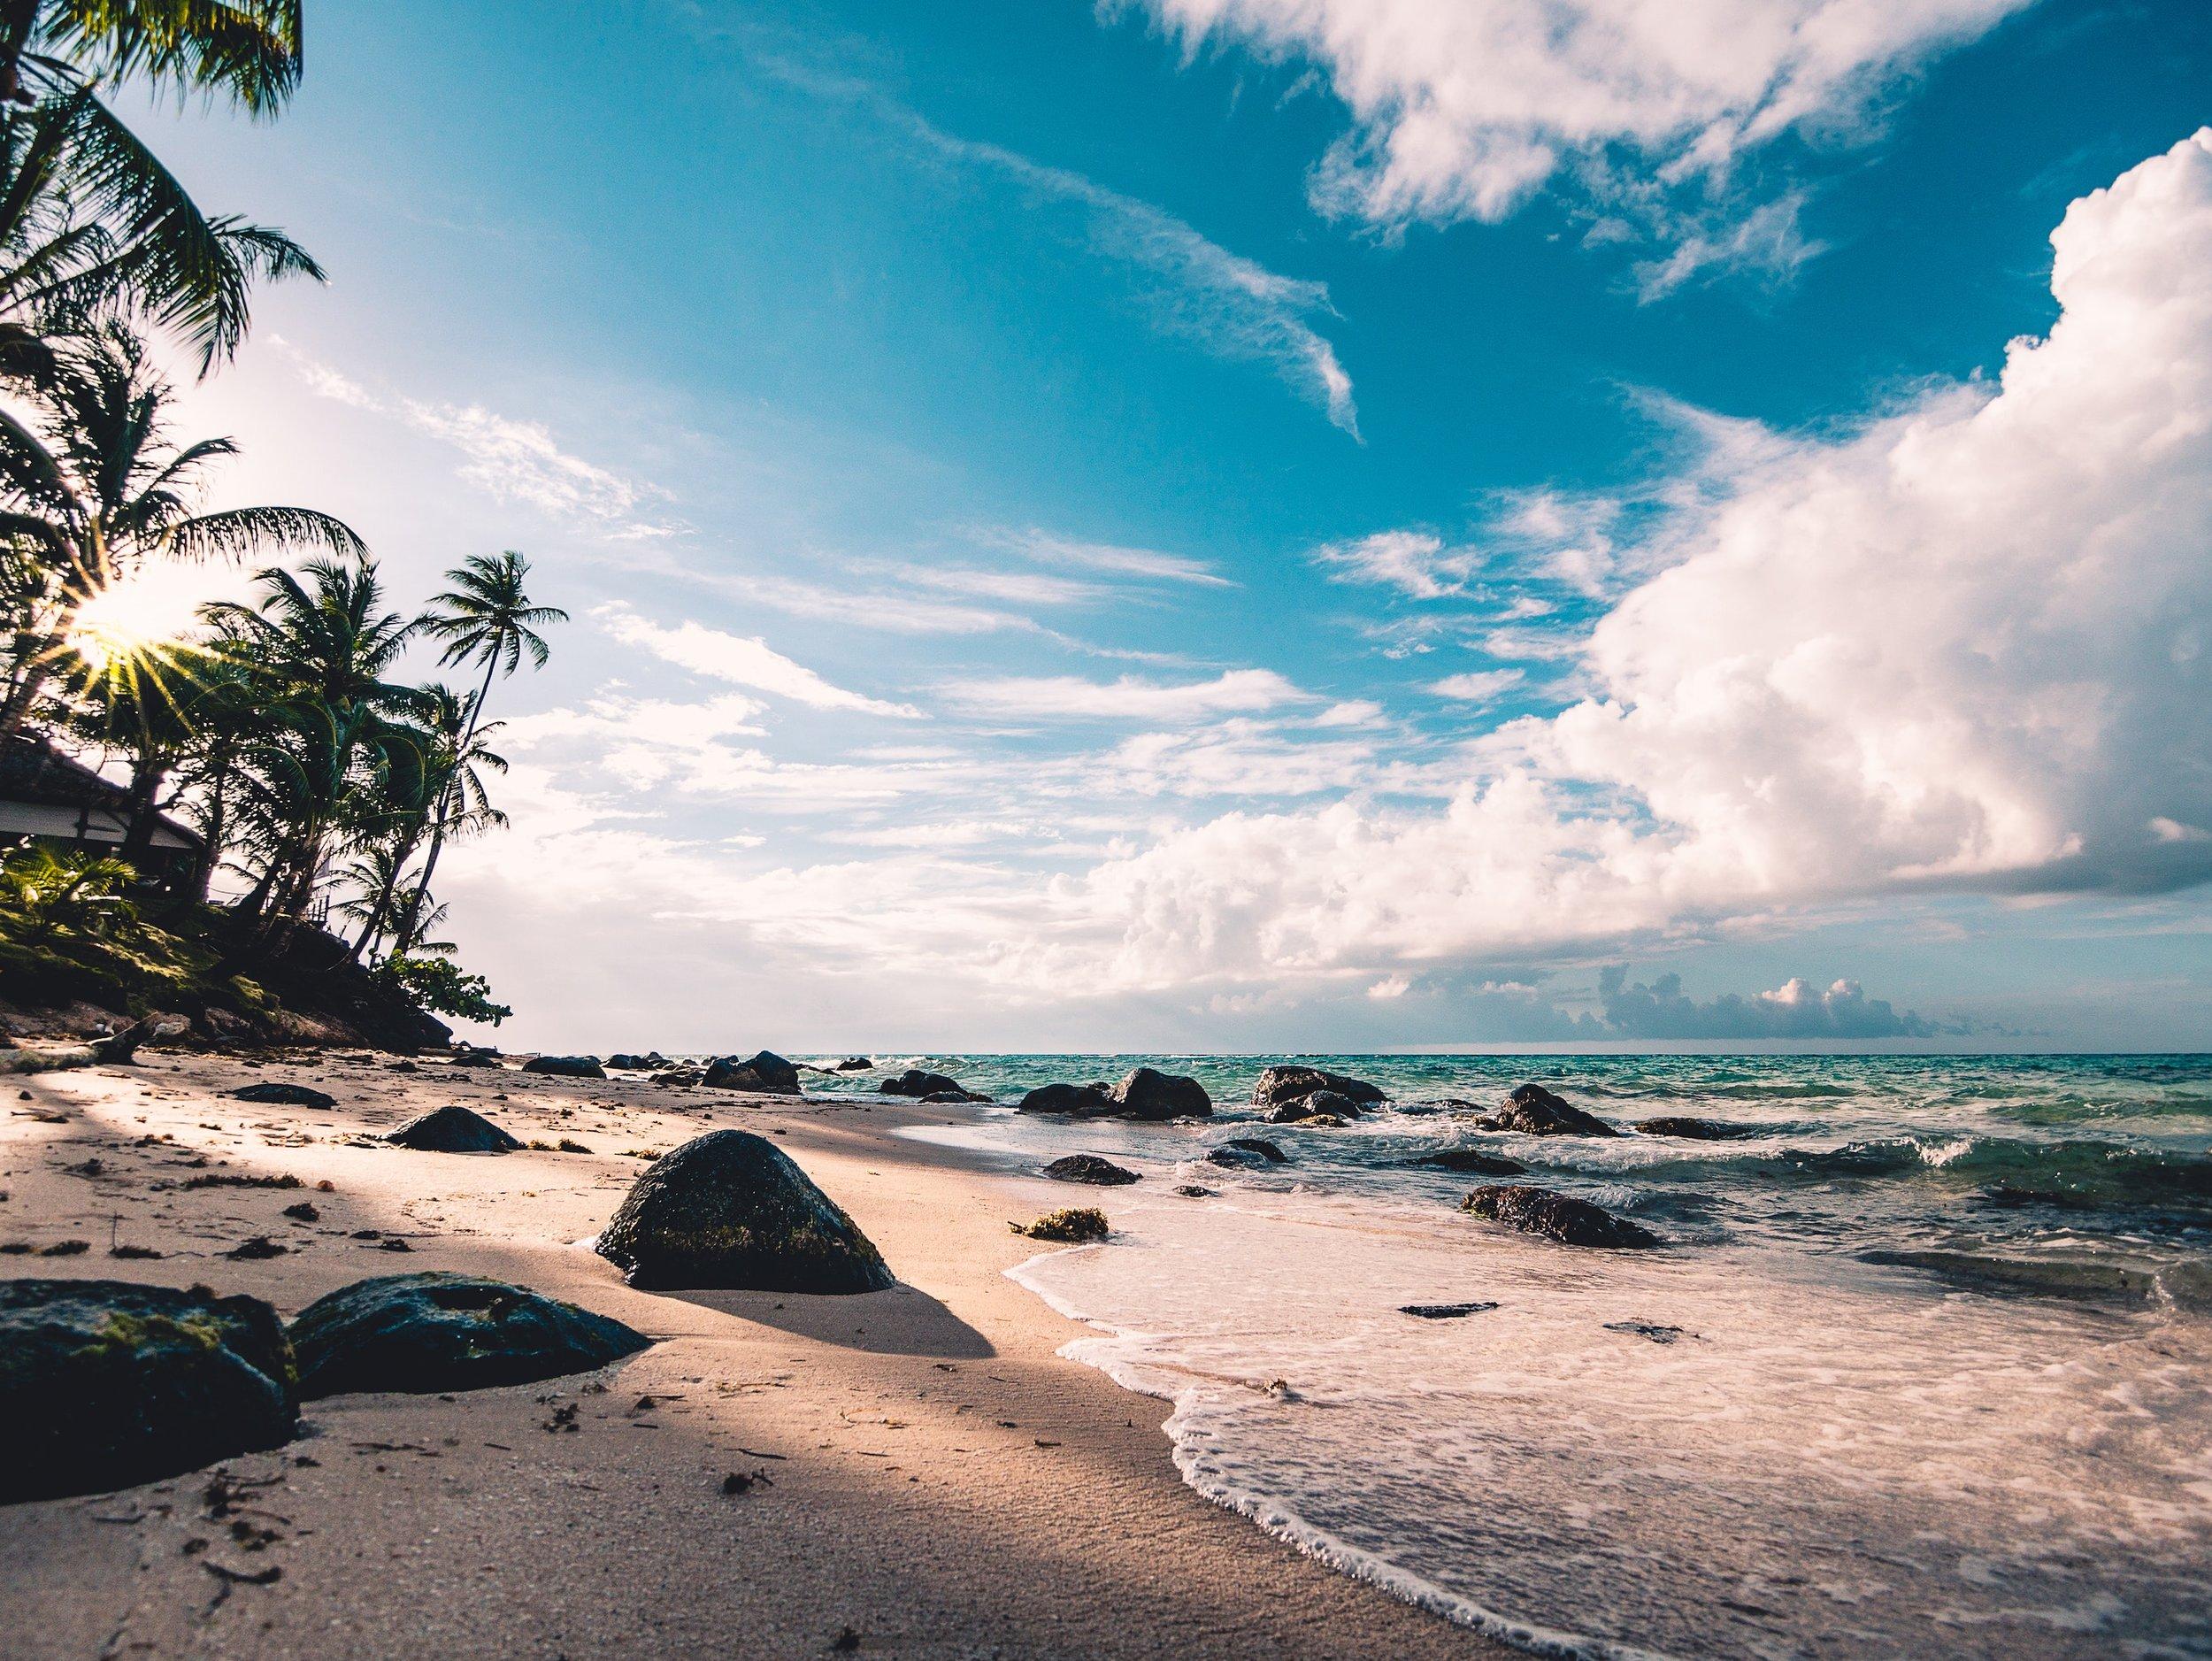 beach-clouds-daytime-994605.jpg